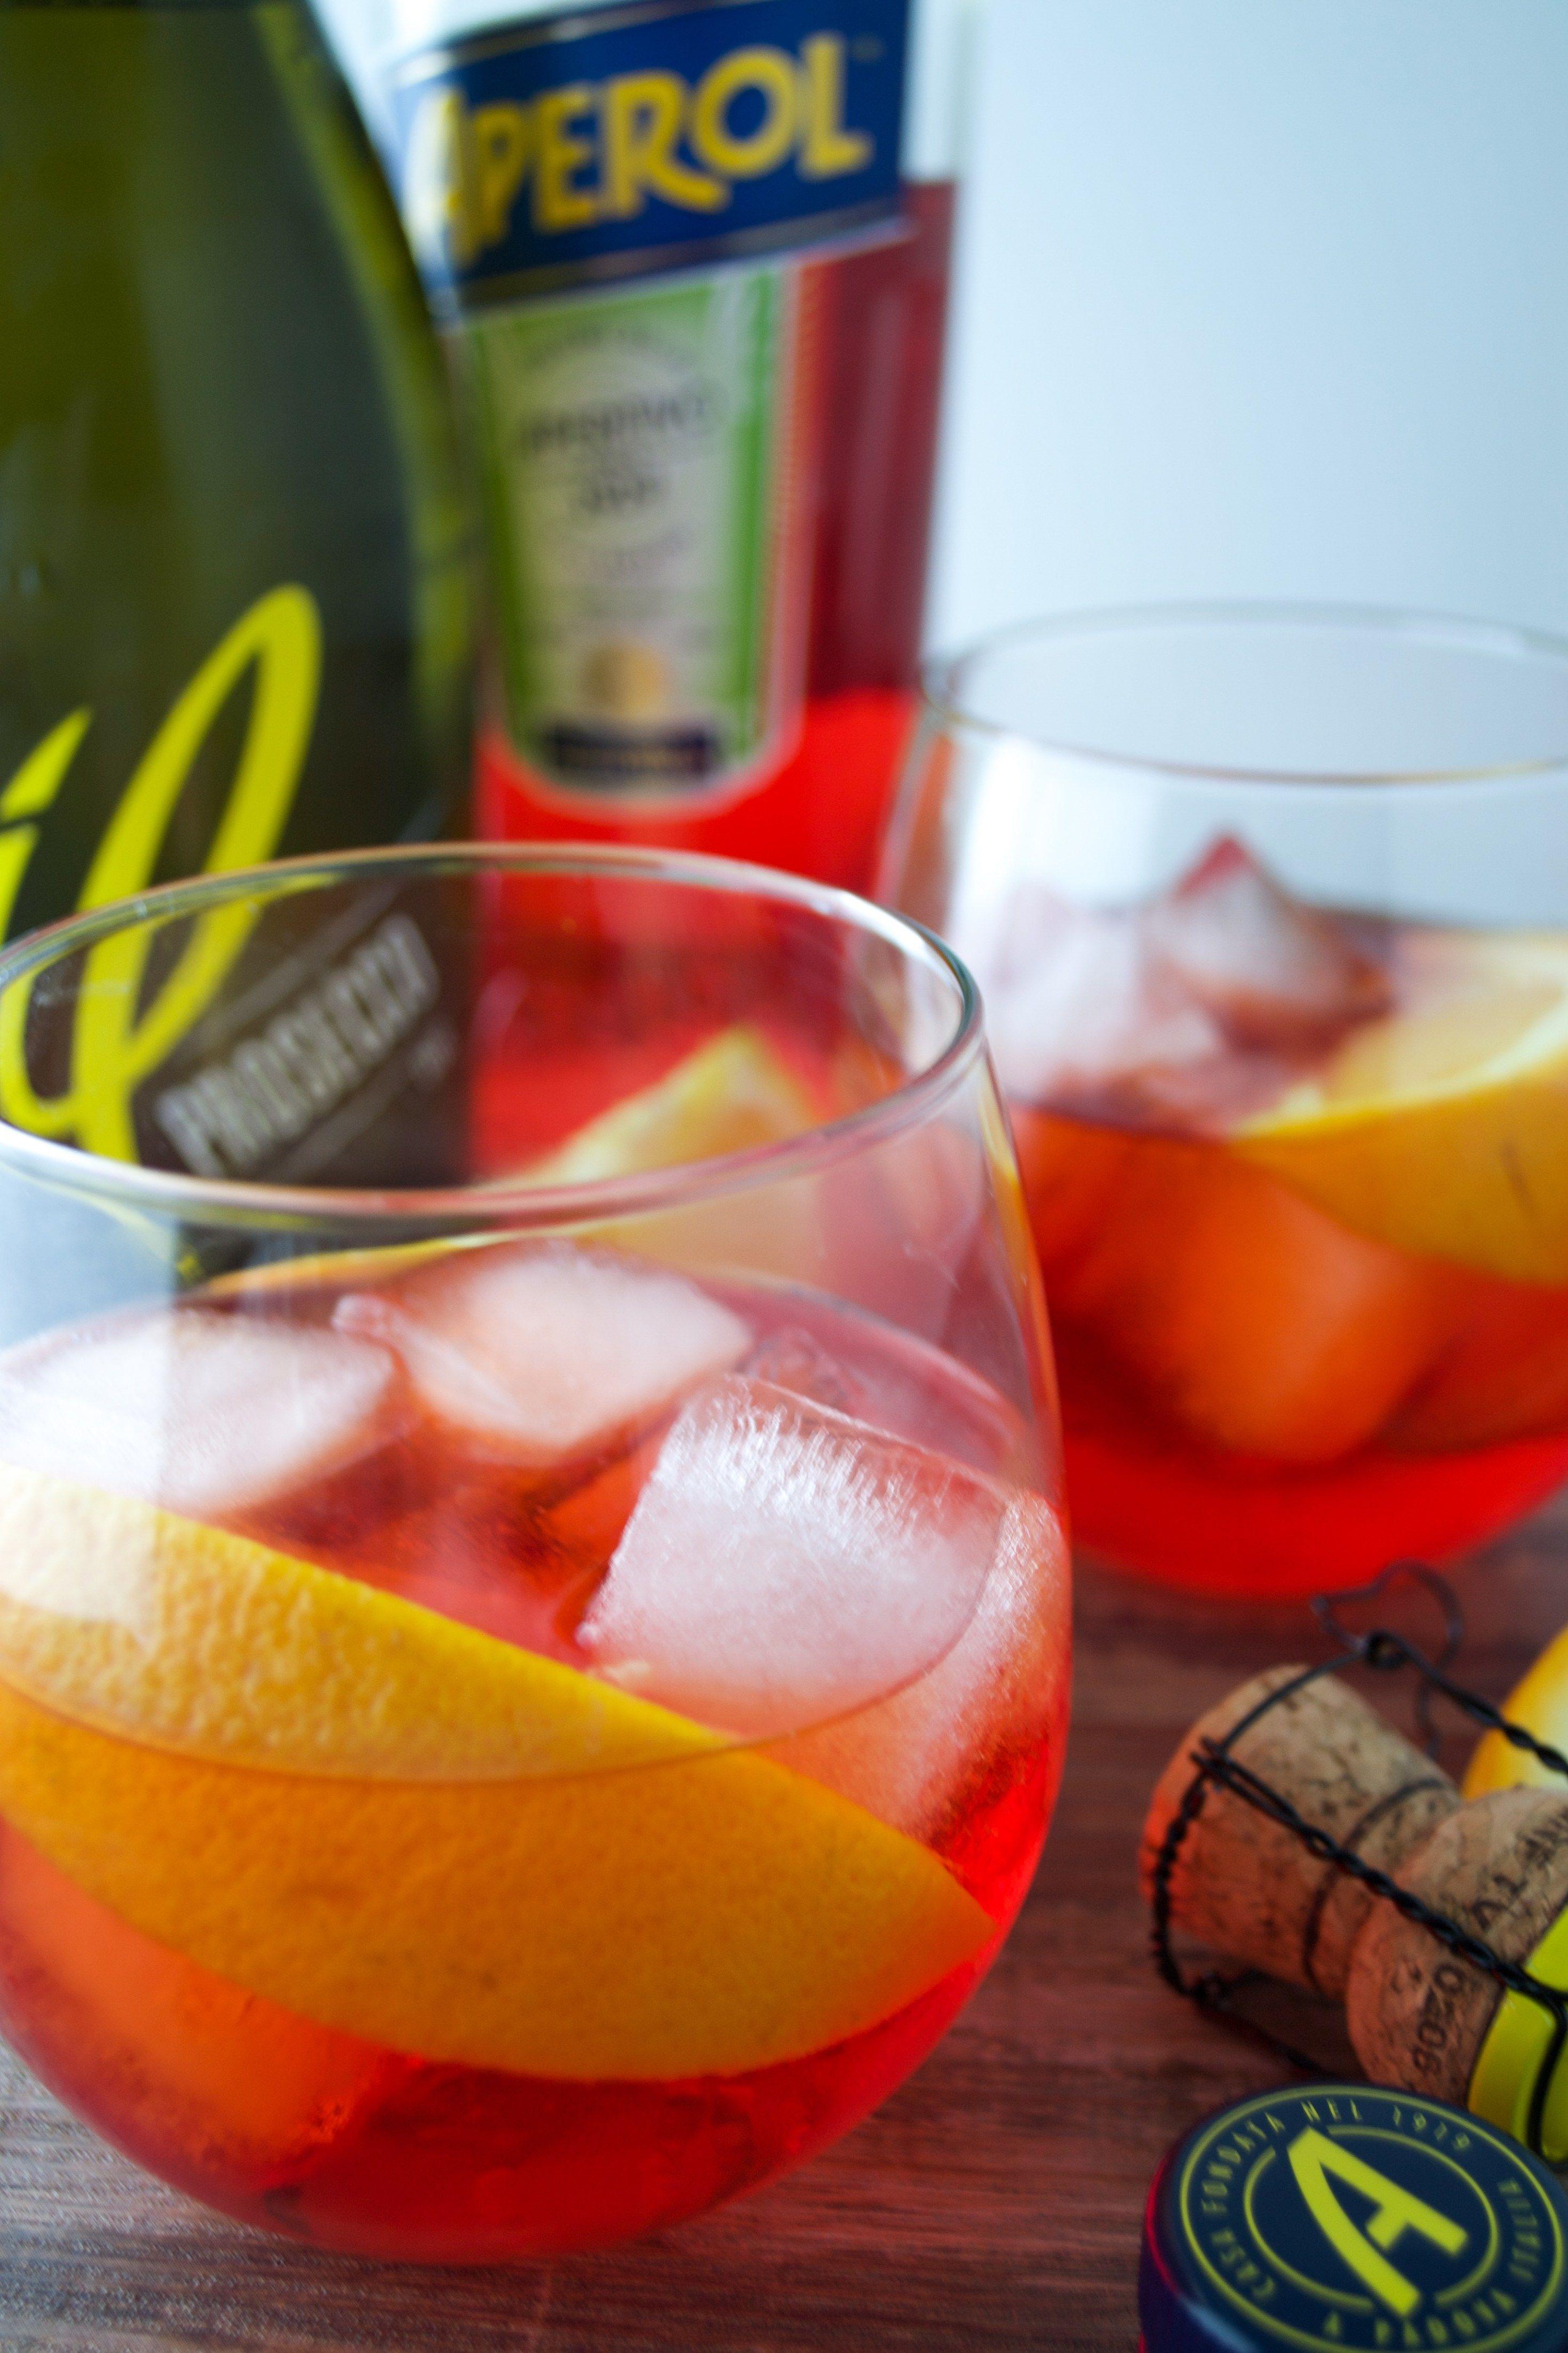 Bring Home A Taste Of Italy With A Light And Zesty Aperol Spritz Recipe Aperol Spritz Spritz Aperol